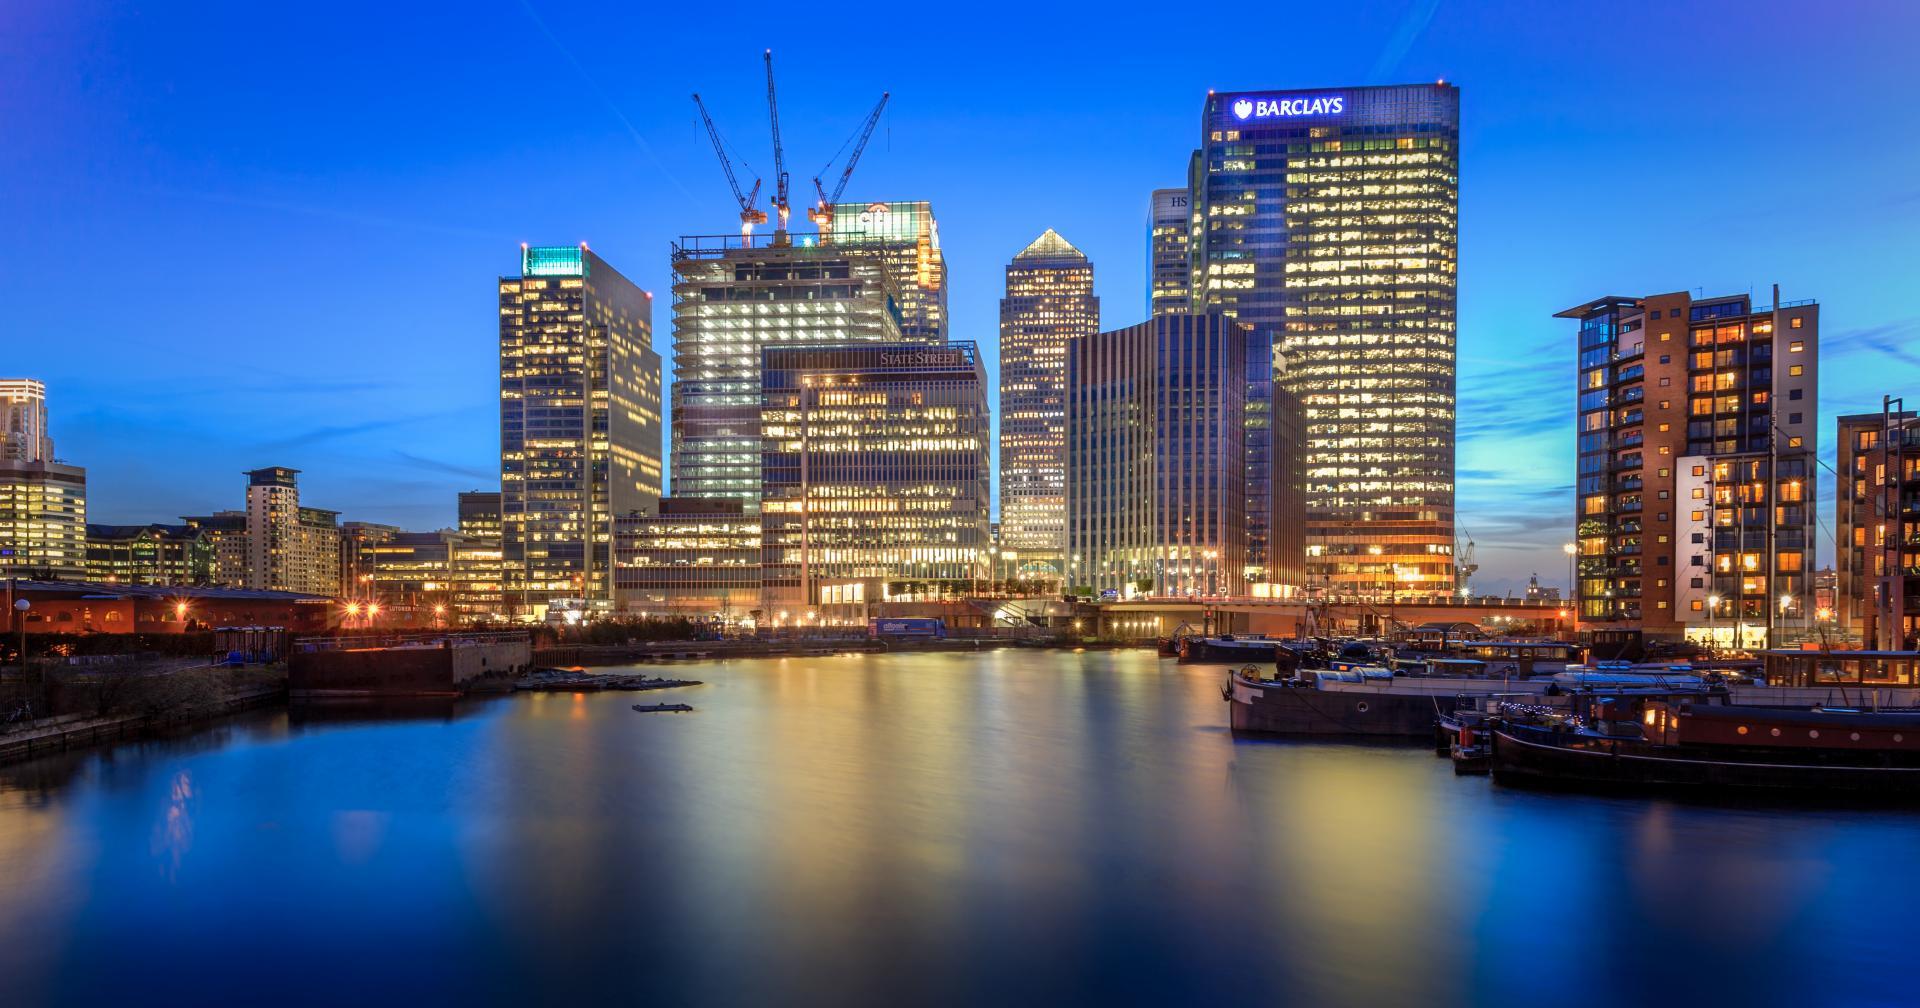 City Living - Focus On Canary Wharf